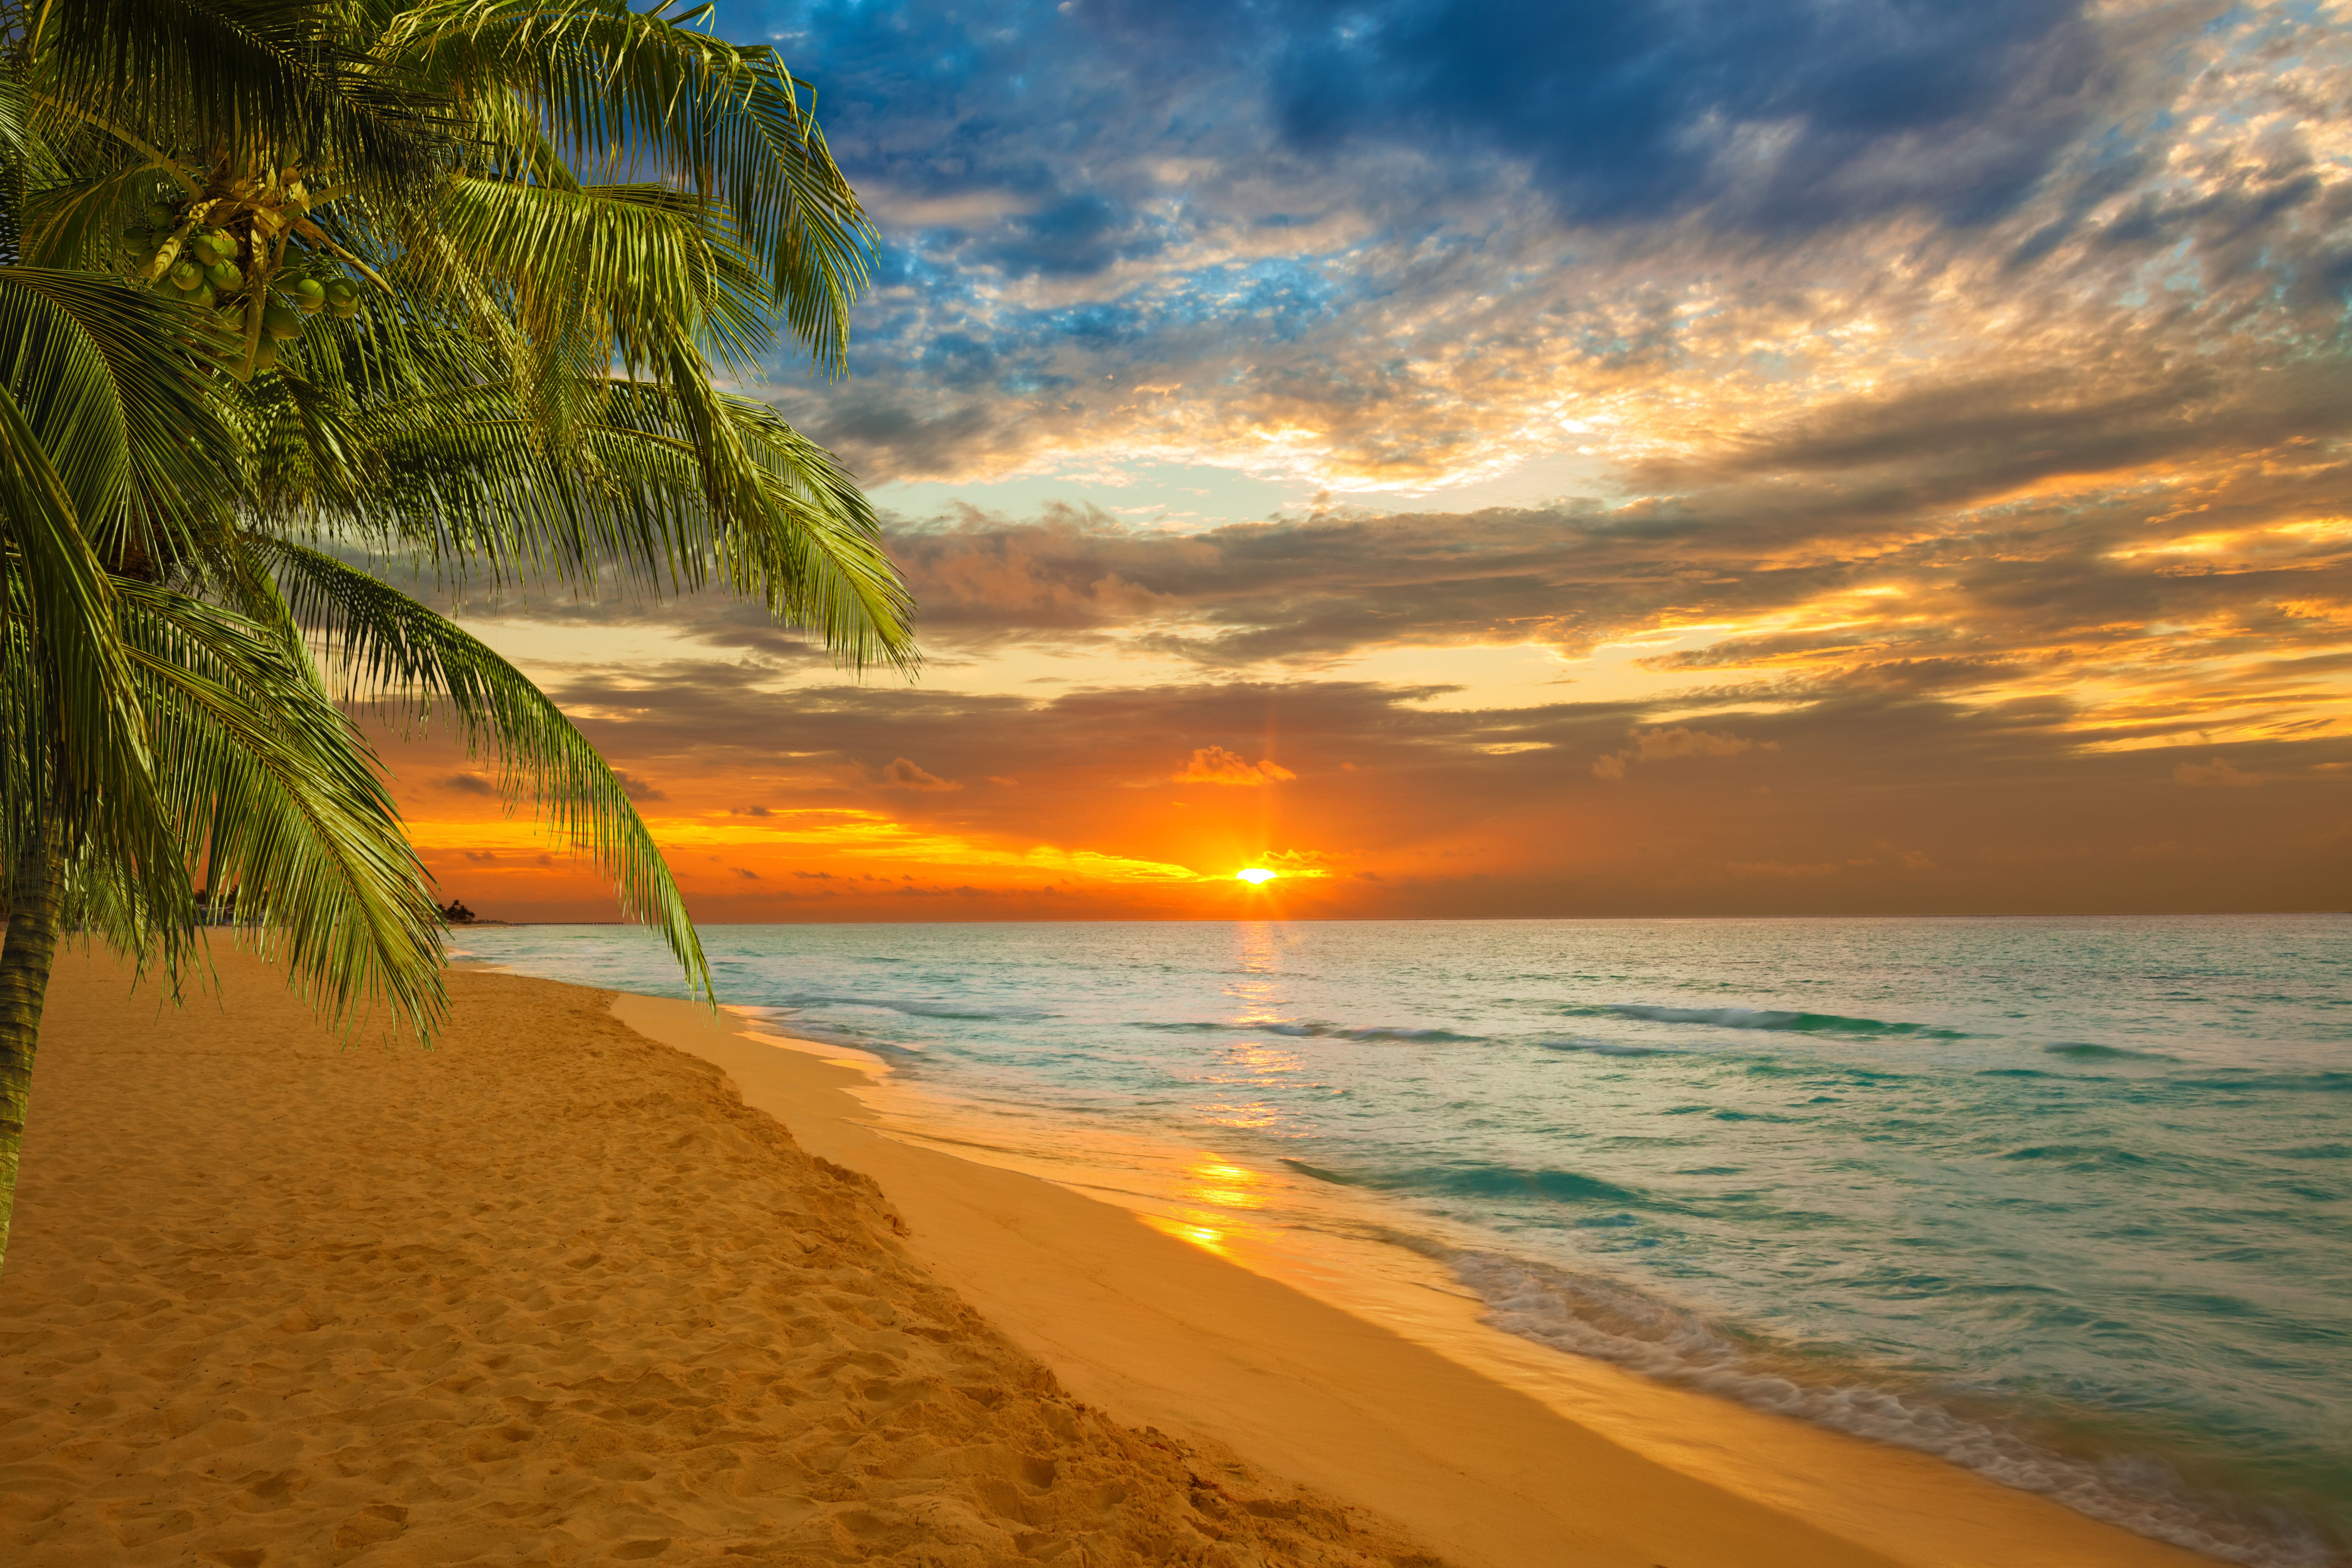 устройстве картинки морского пляжа на рабочий стол хромопластов отчасти